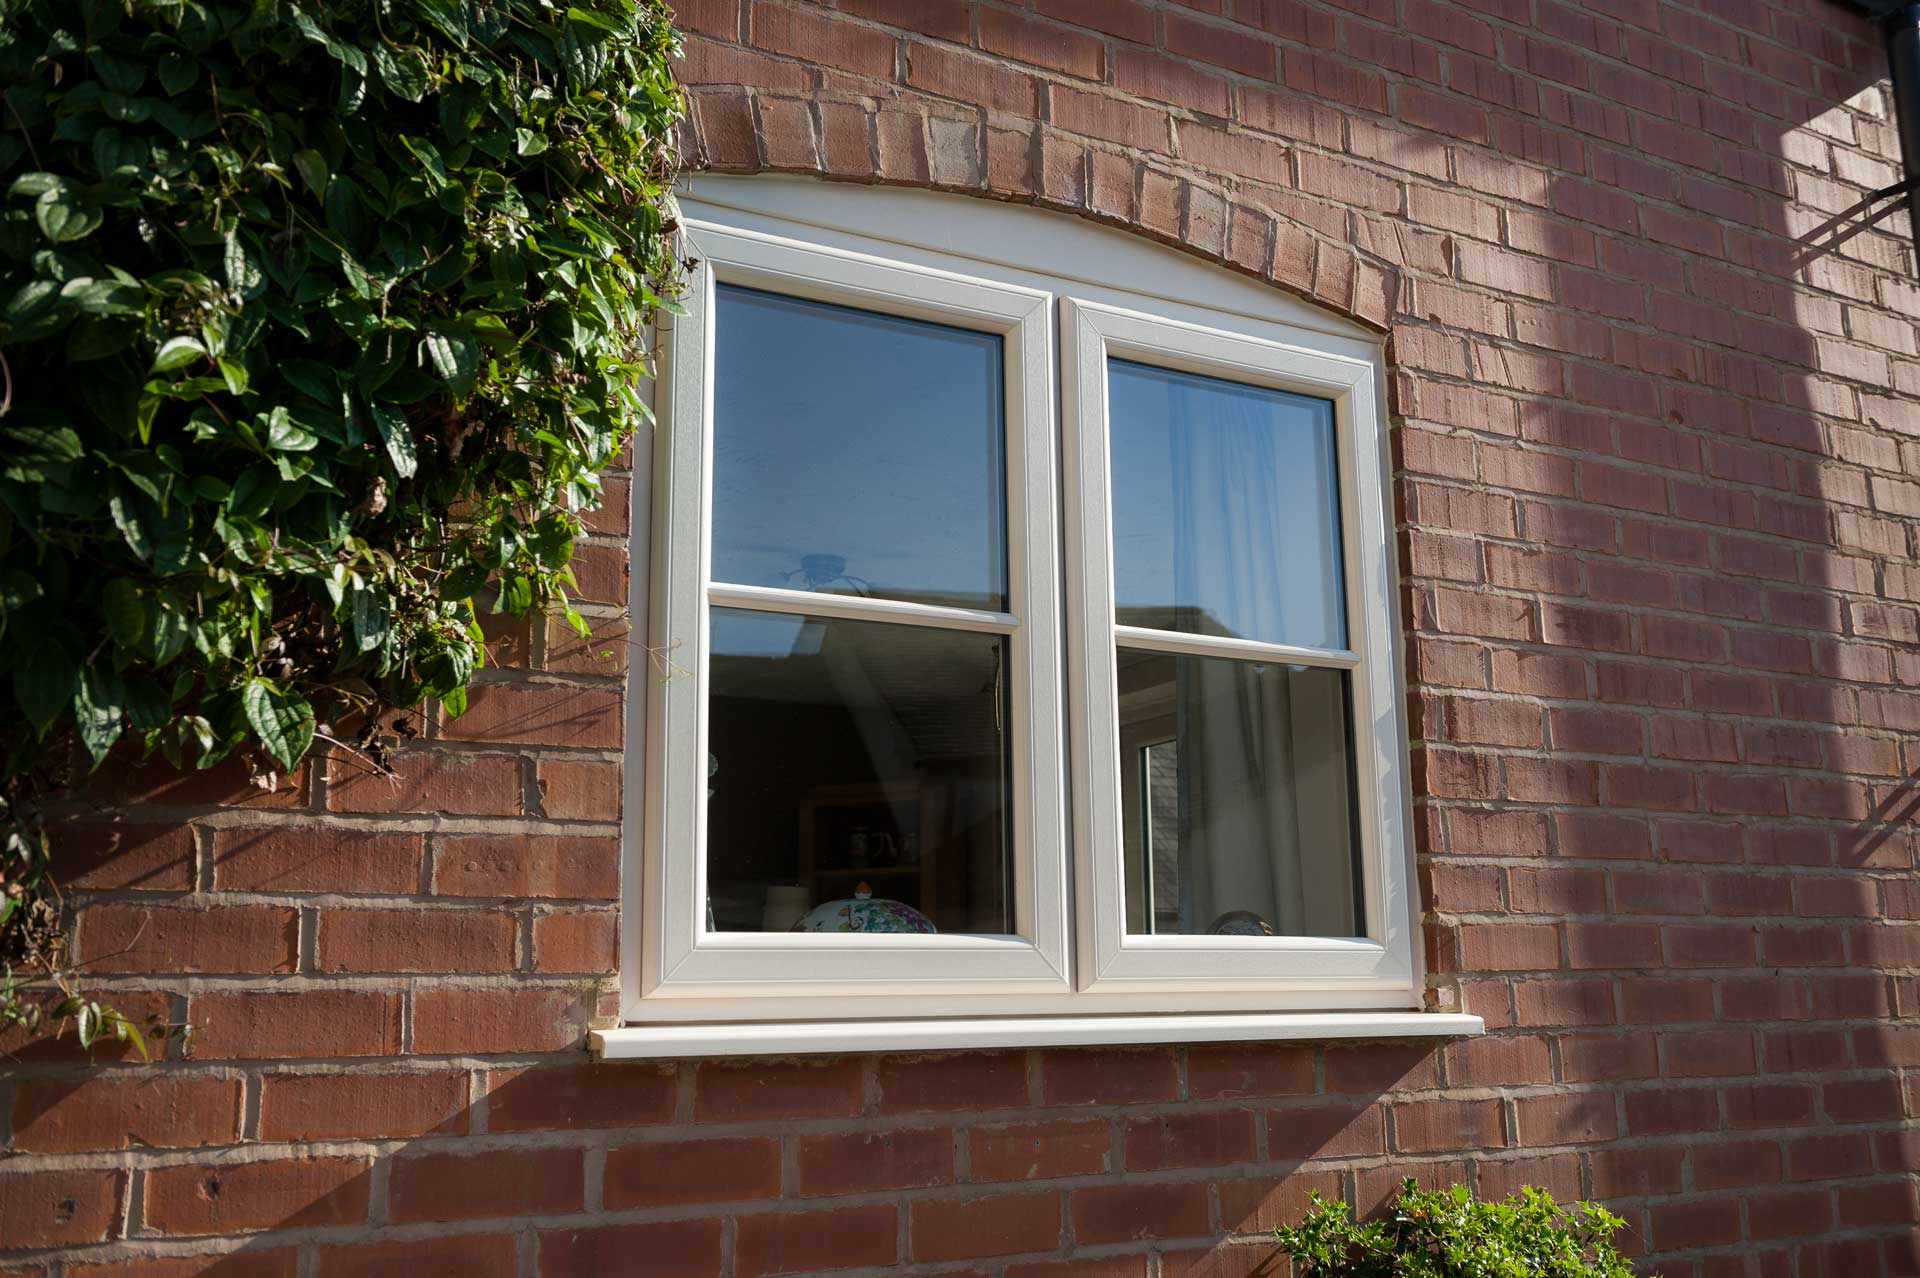 Casement Windows that work as a fire escape